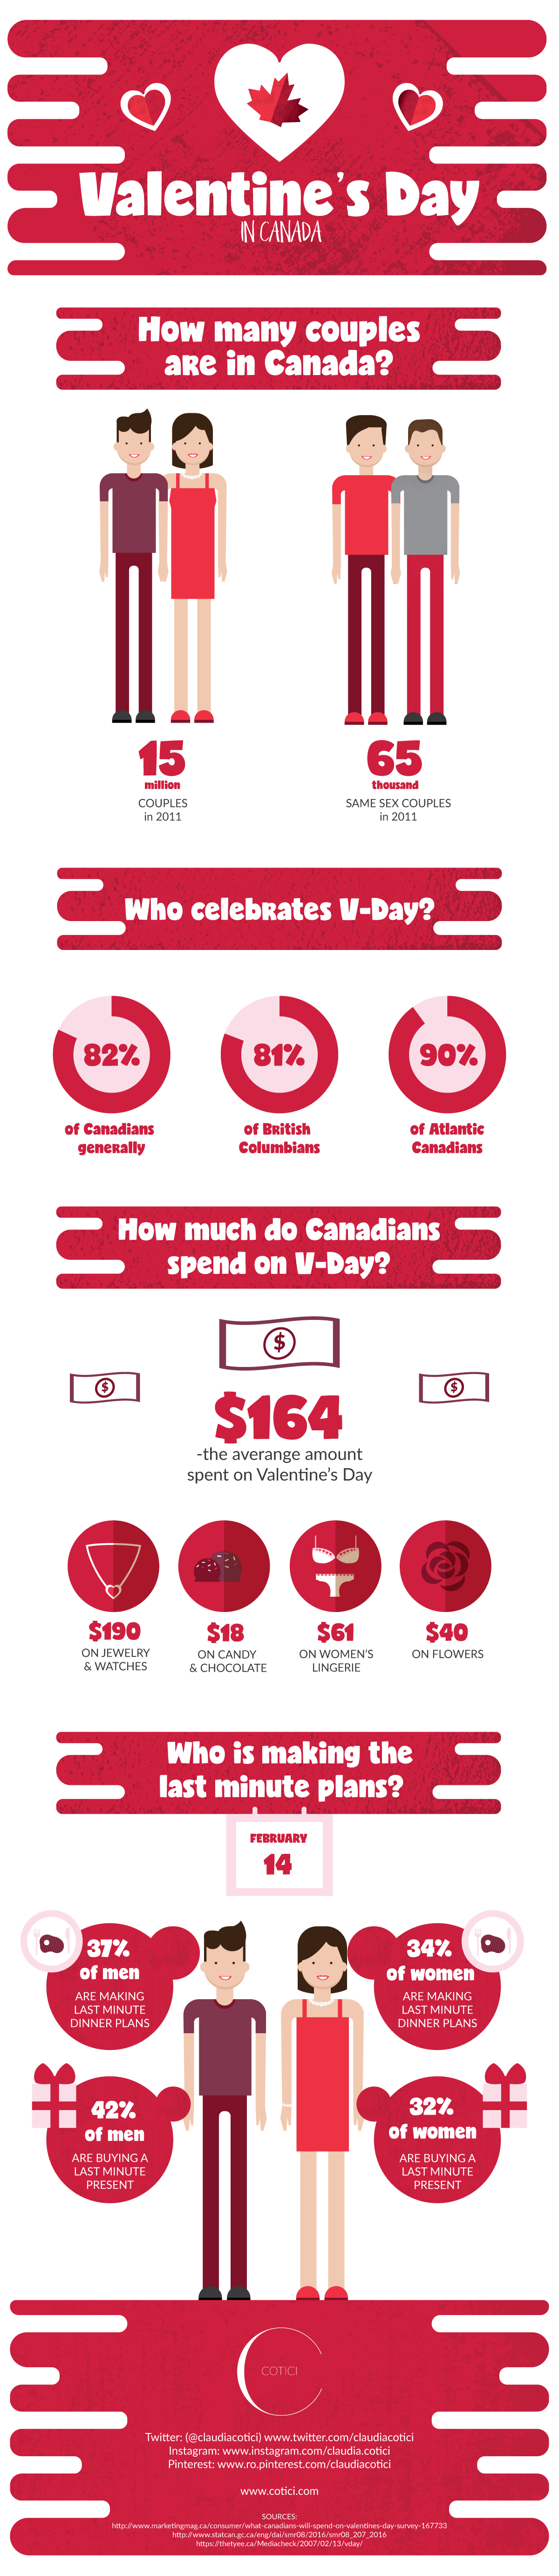 infographic_valentines_day